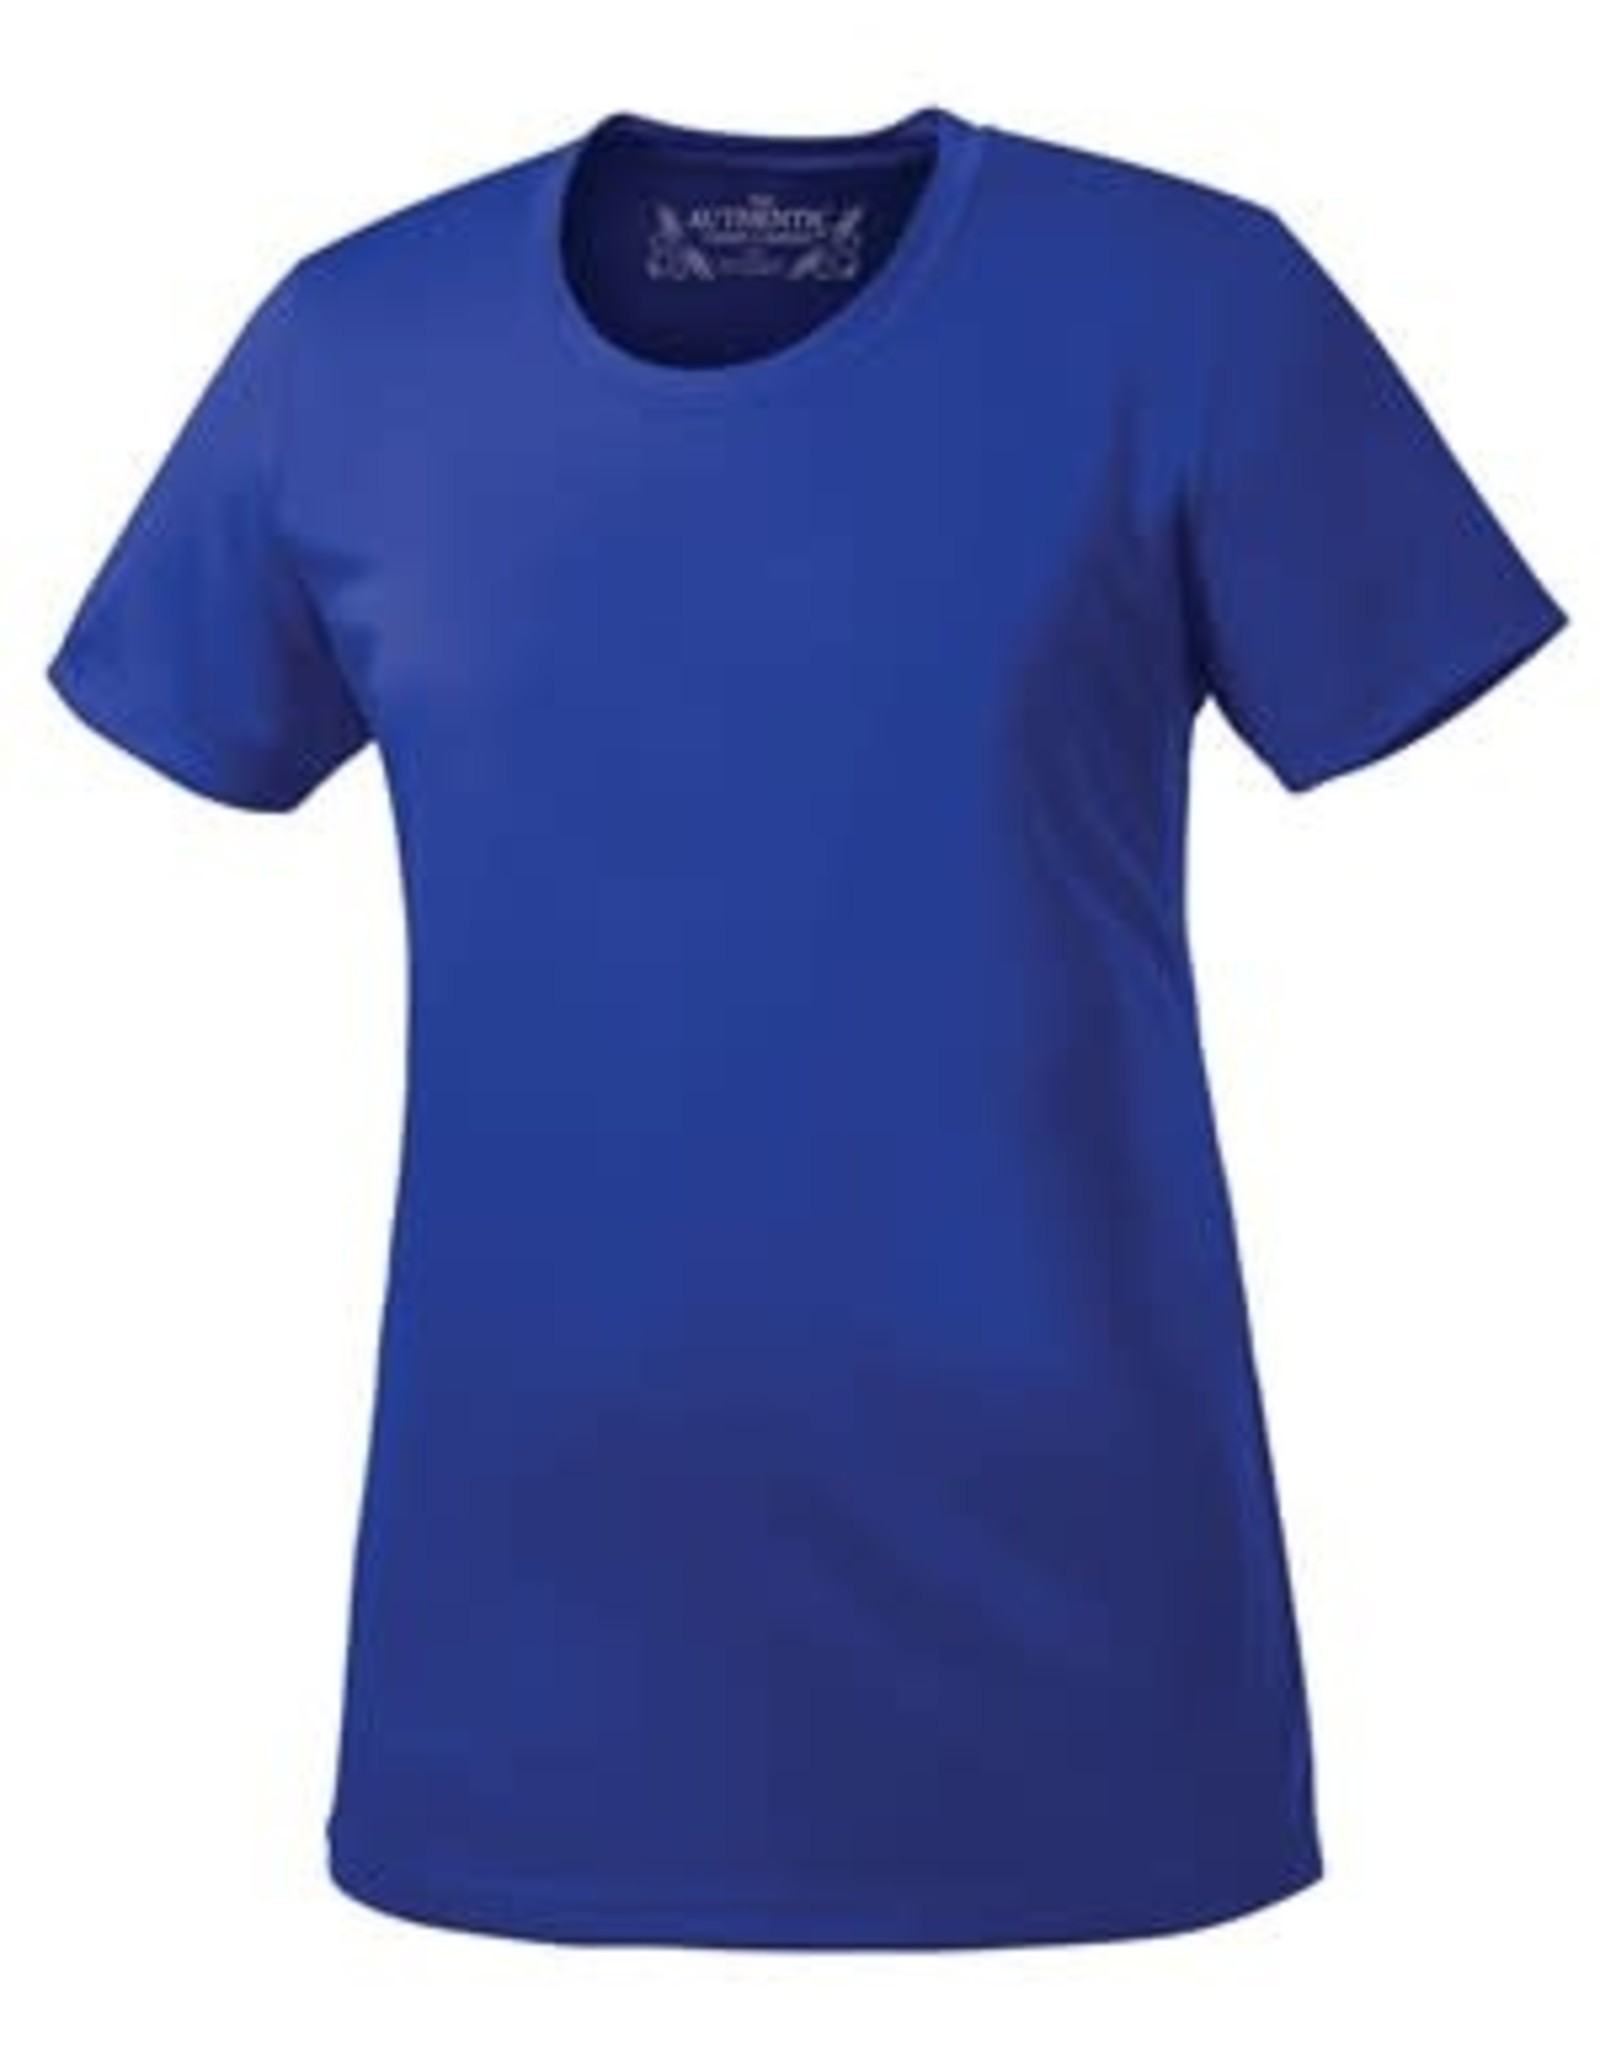 Custom Ladies Performance T-shirt - L350